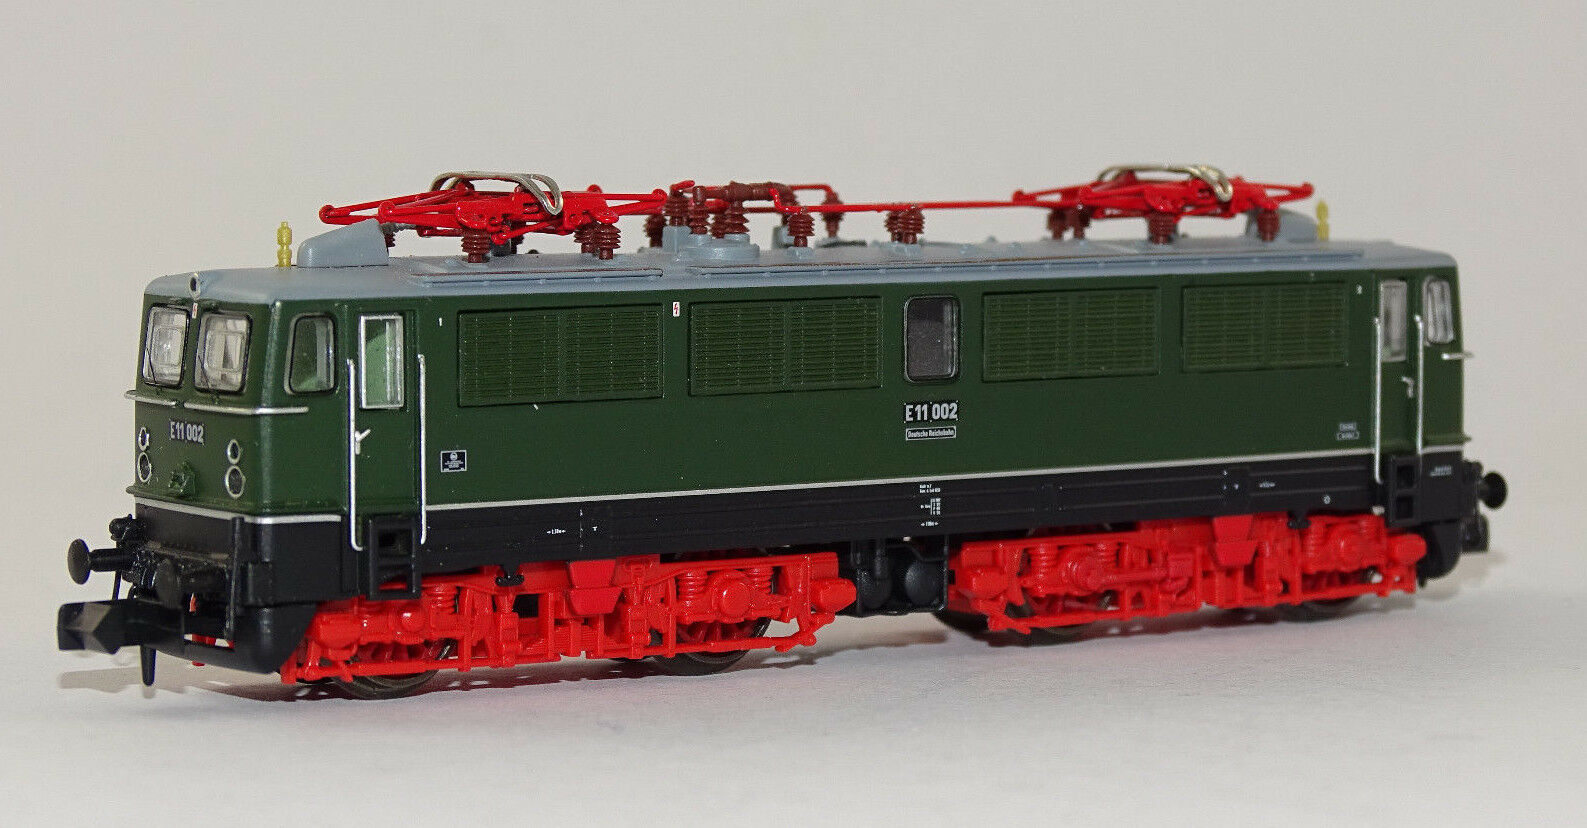 Arnold hn2304 elektrolokomotive e11 002 Dr verde rojo Electric Locomotive New